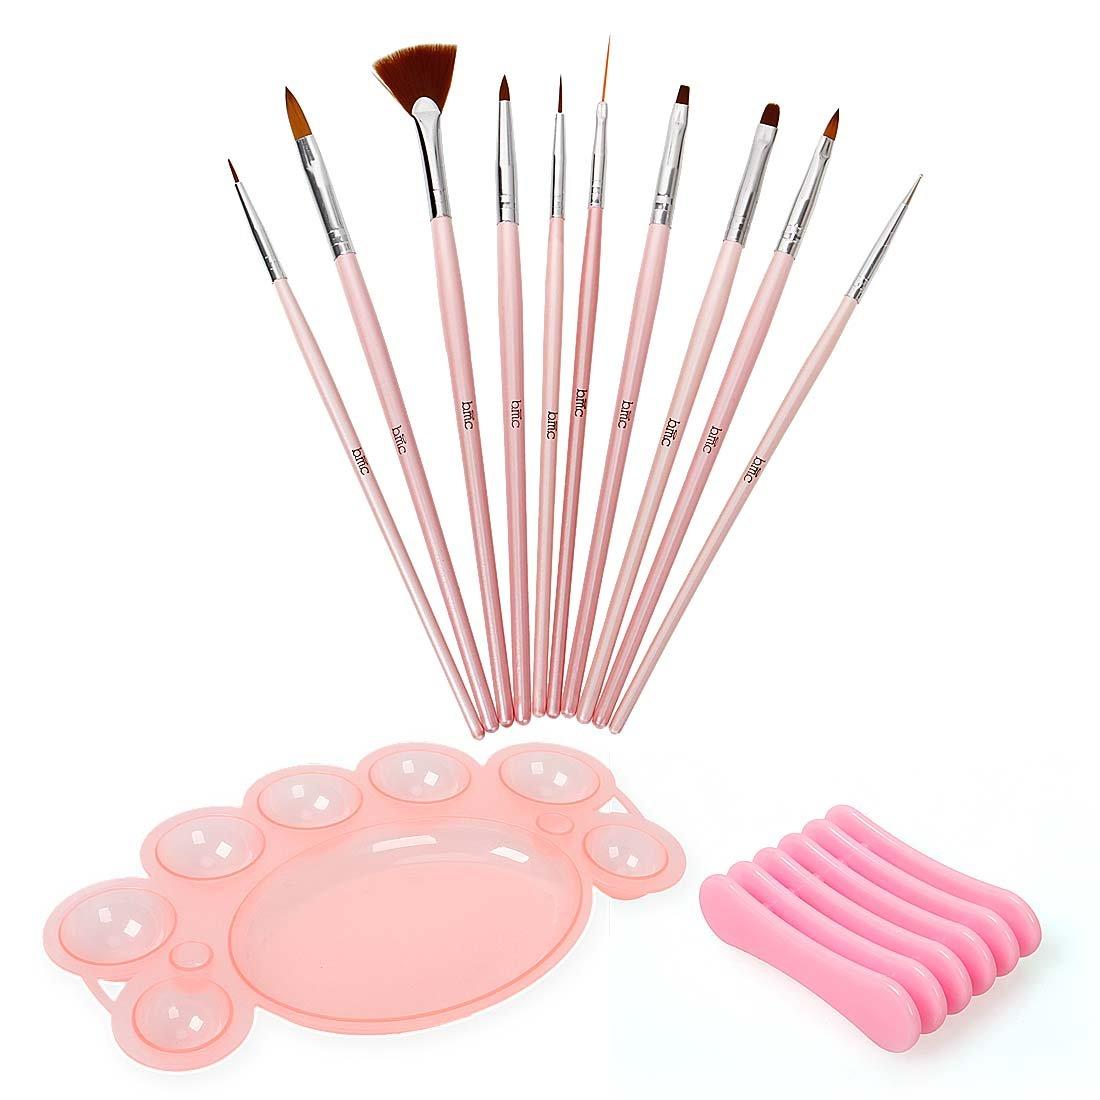 Amazon.com : BMC 12 pc Nail Art Beauty Design Polish Brush Dotting ...